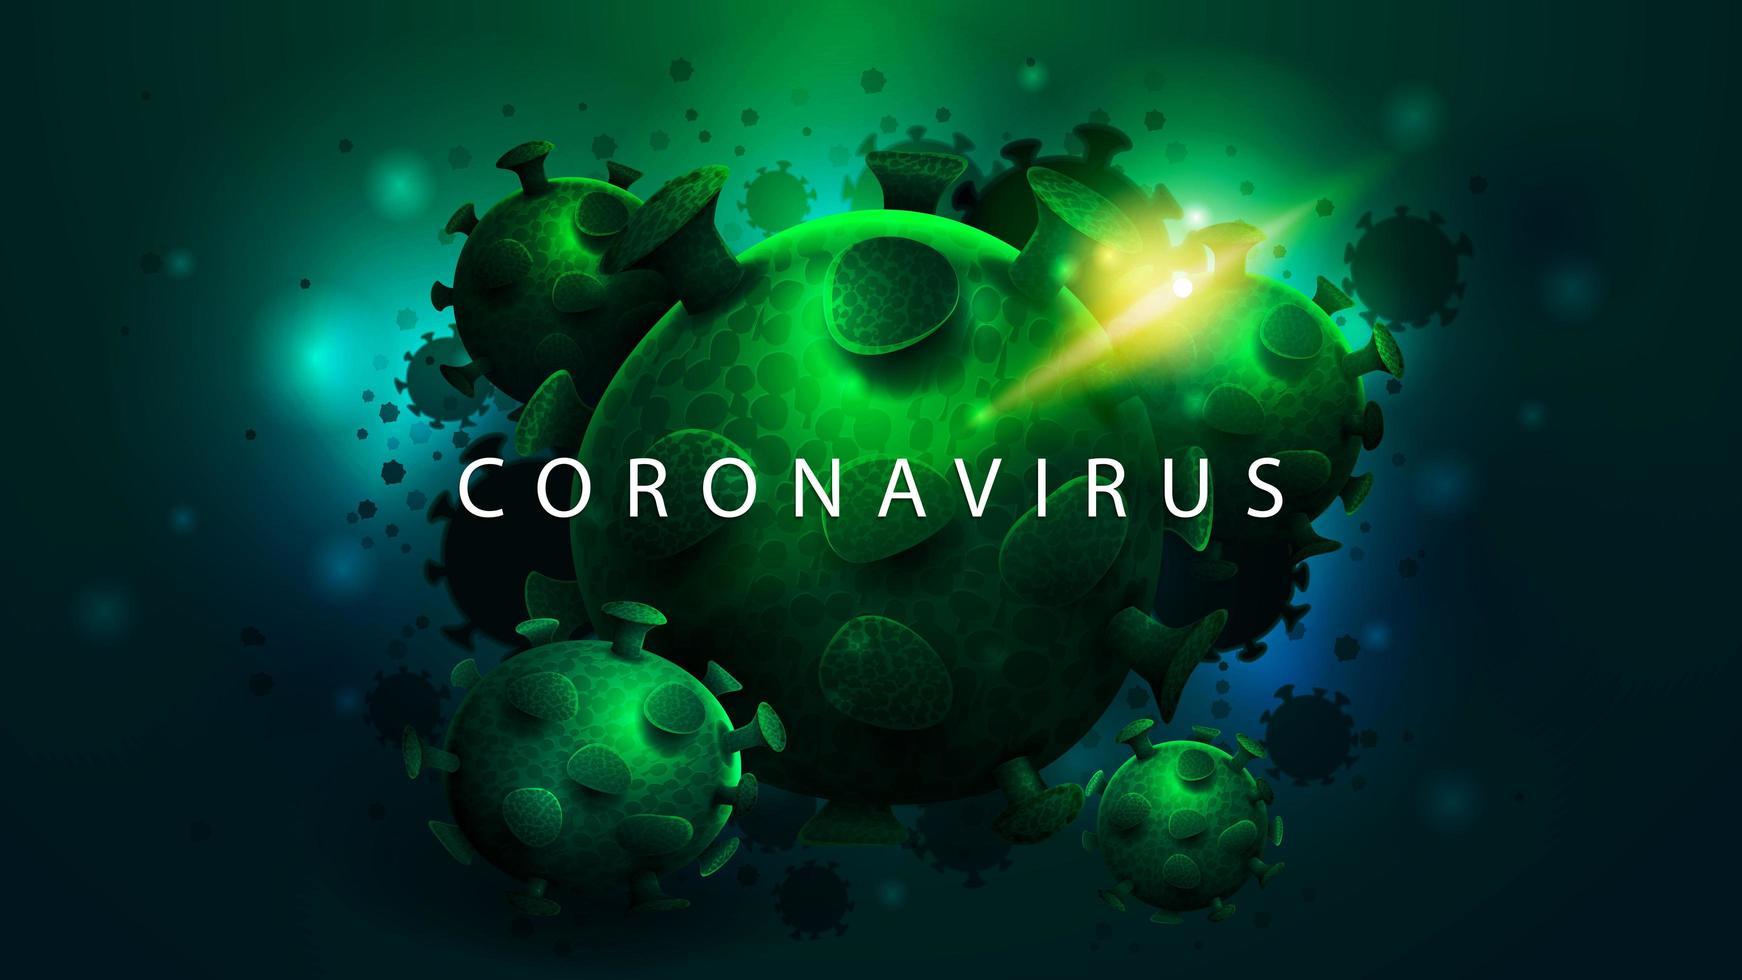 mörk affisch med stora gröna koronavirusmolekyler vektor